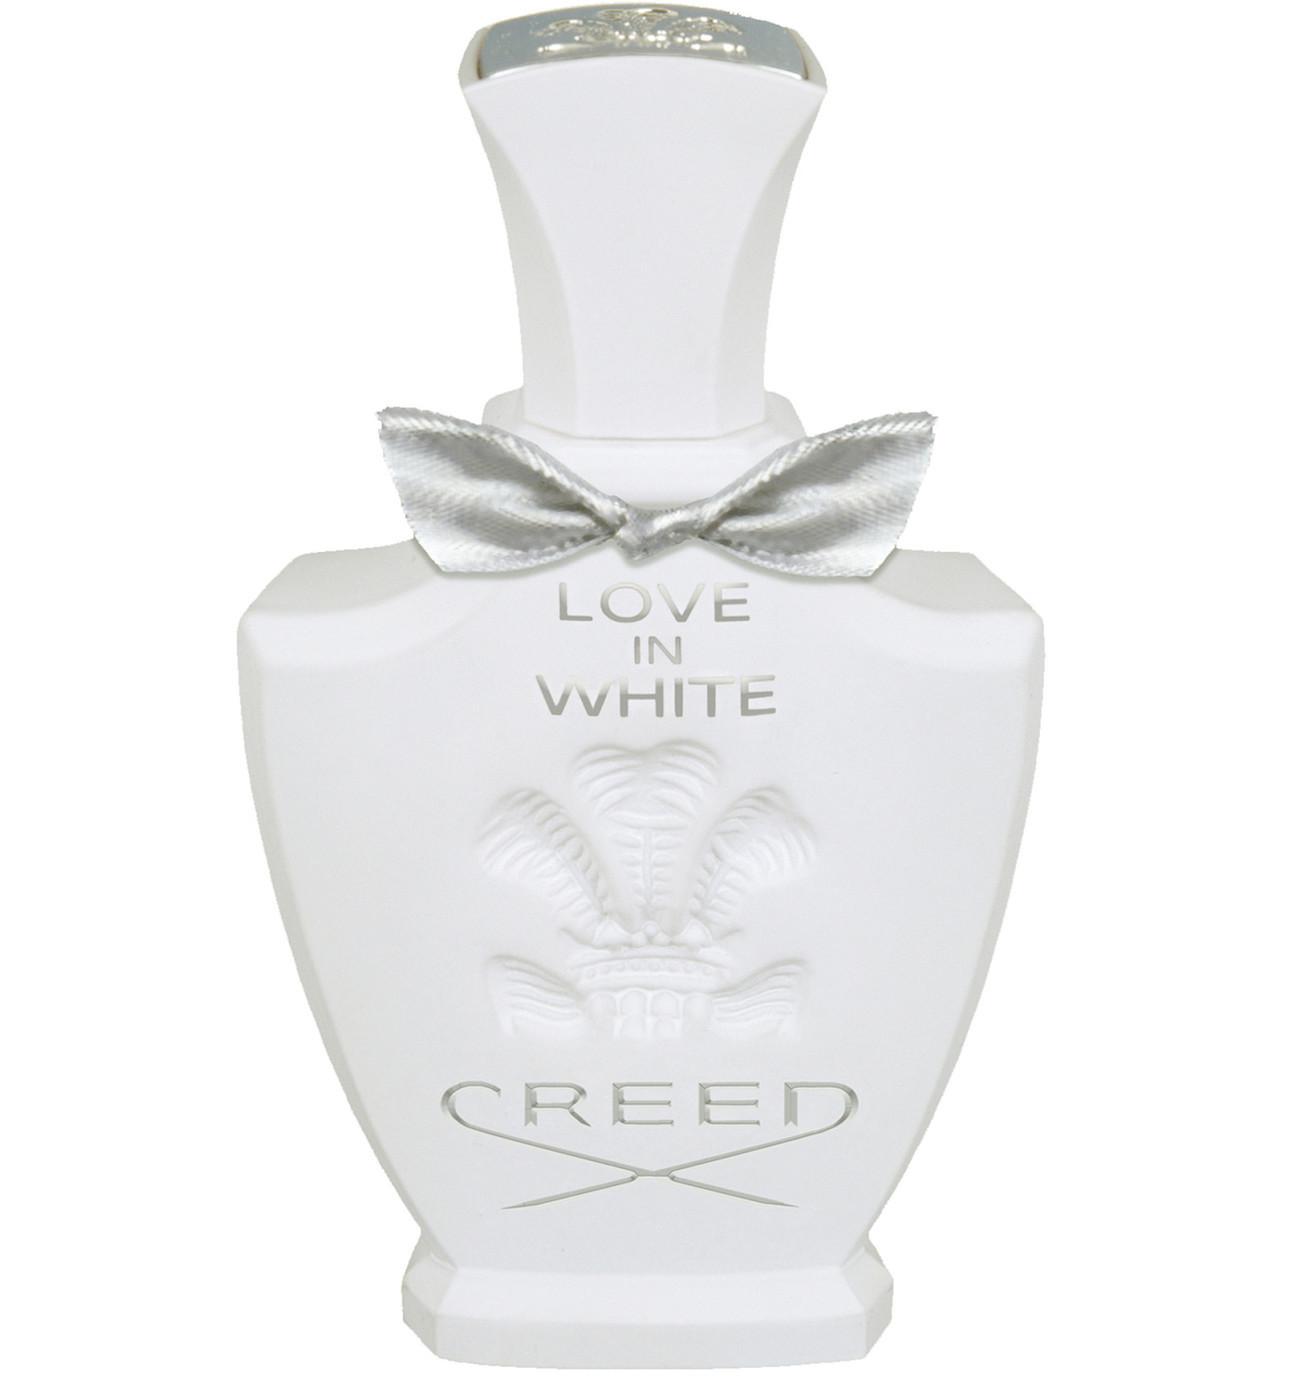 Love in white 75ml david jones content dhlflorist Images